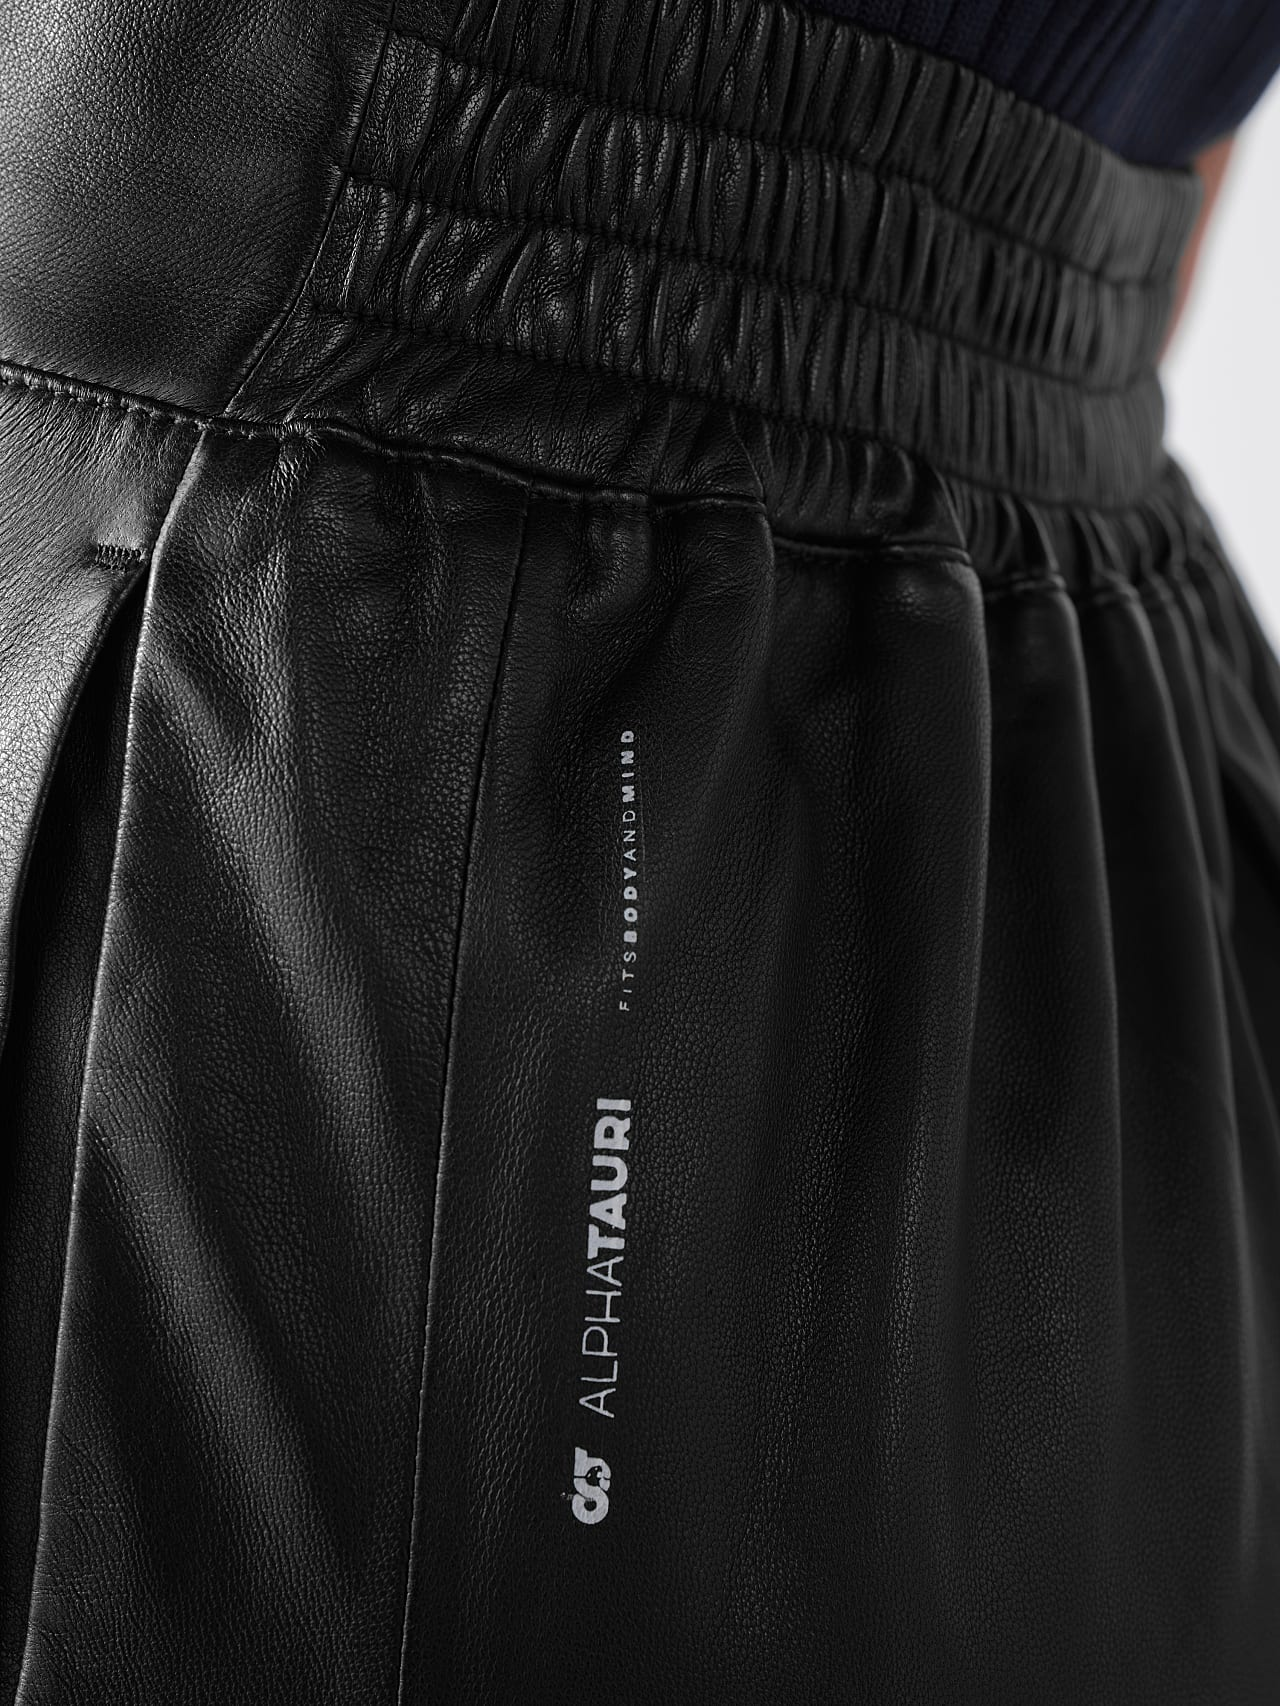 LEXSI V1.Y5.01 Leather Pencil Skirt black Right Alpha Tauri